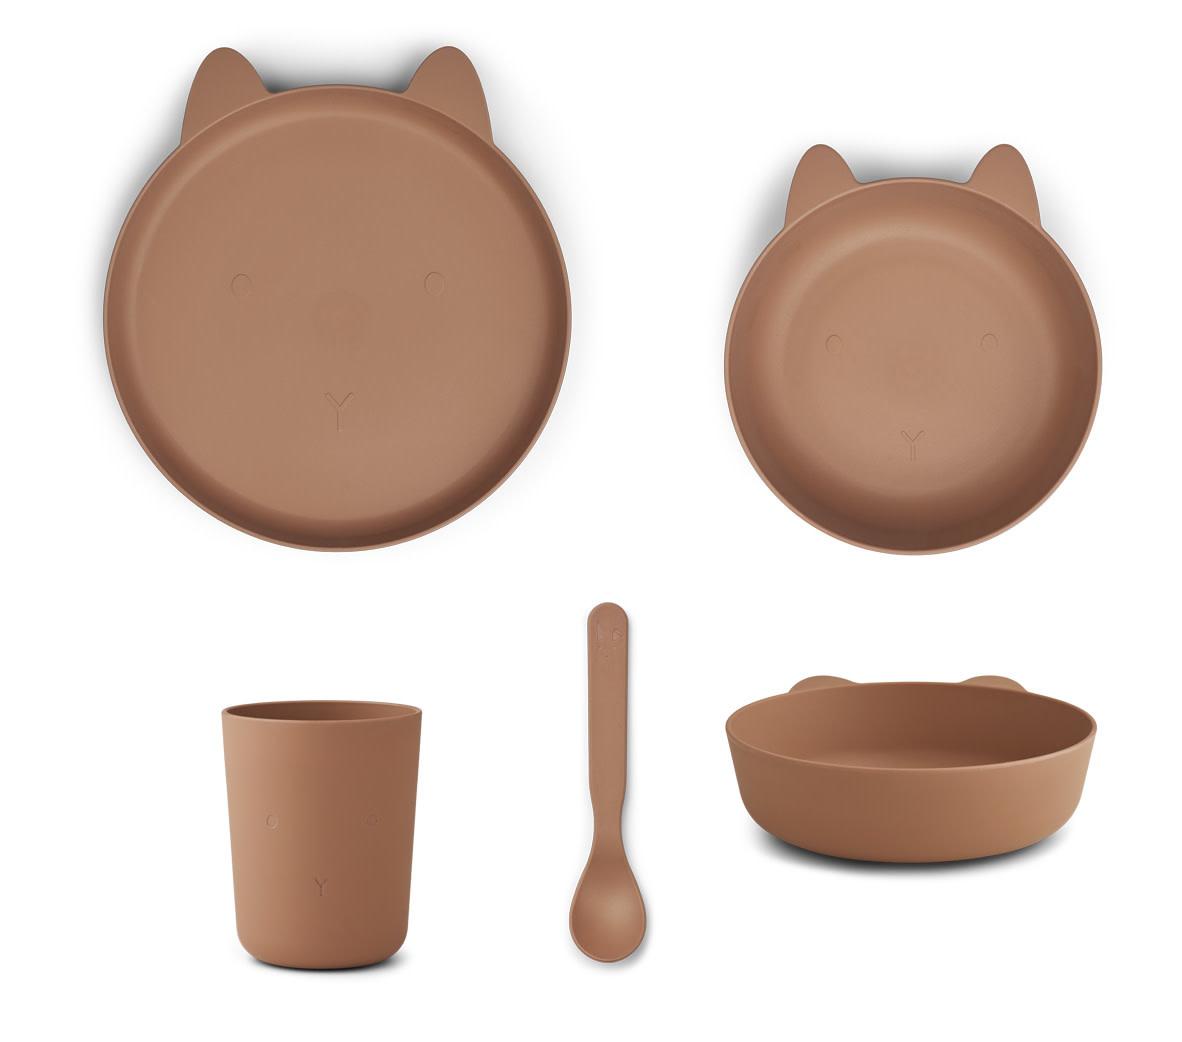 Paul tableware set rabbit tuscany rose-1